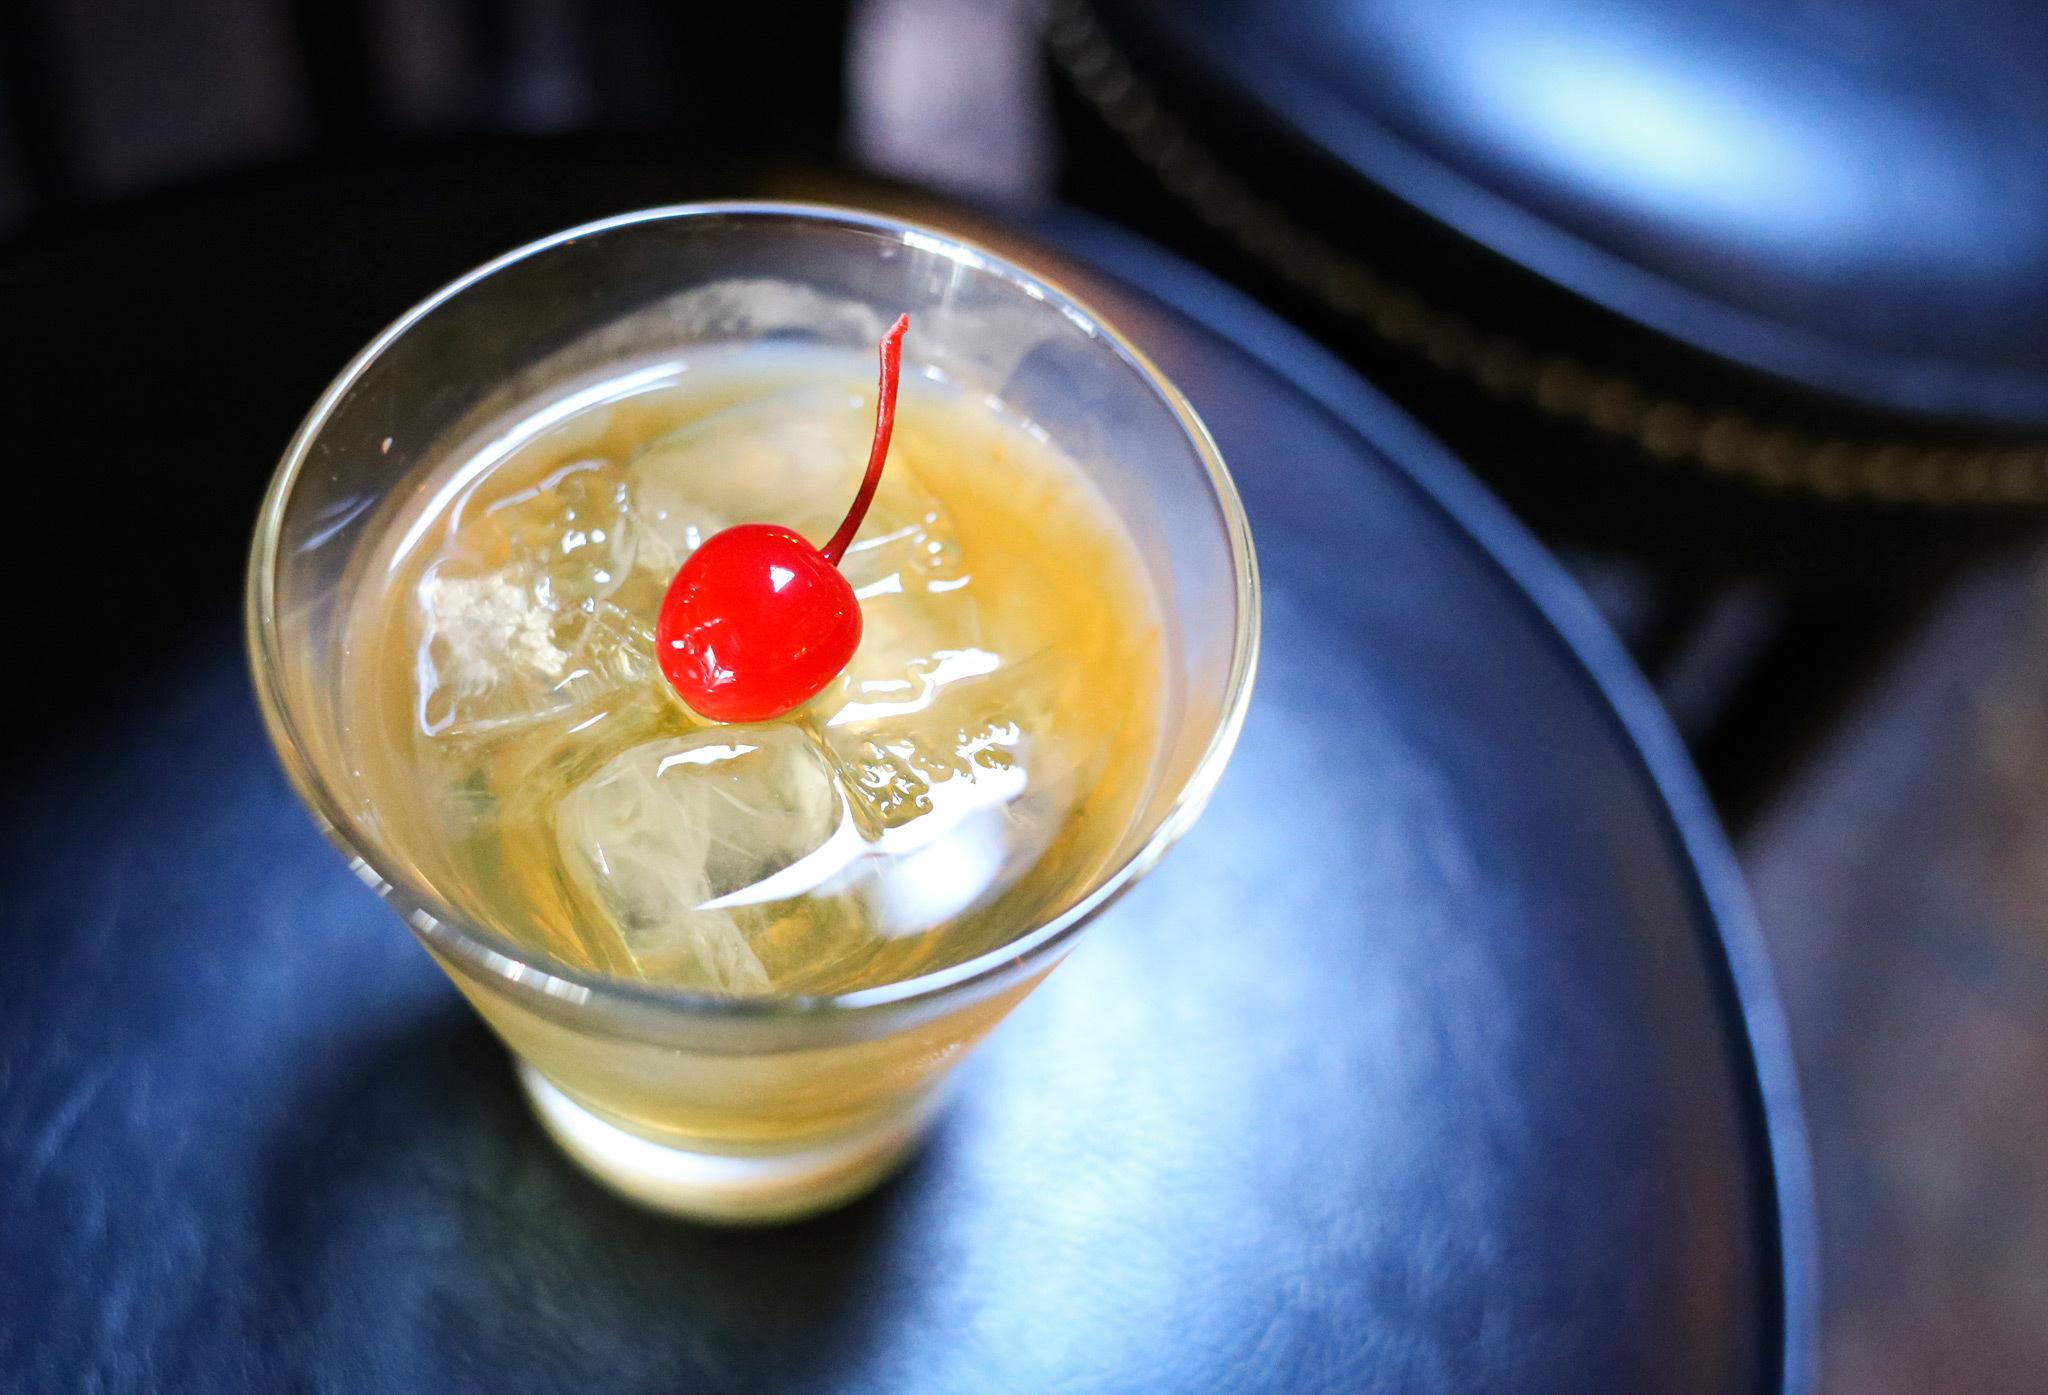 Mr. Furley's Bar